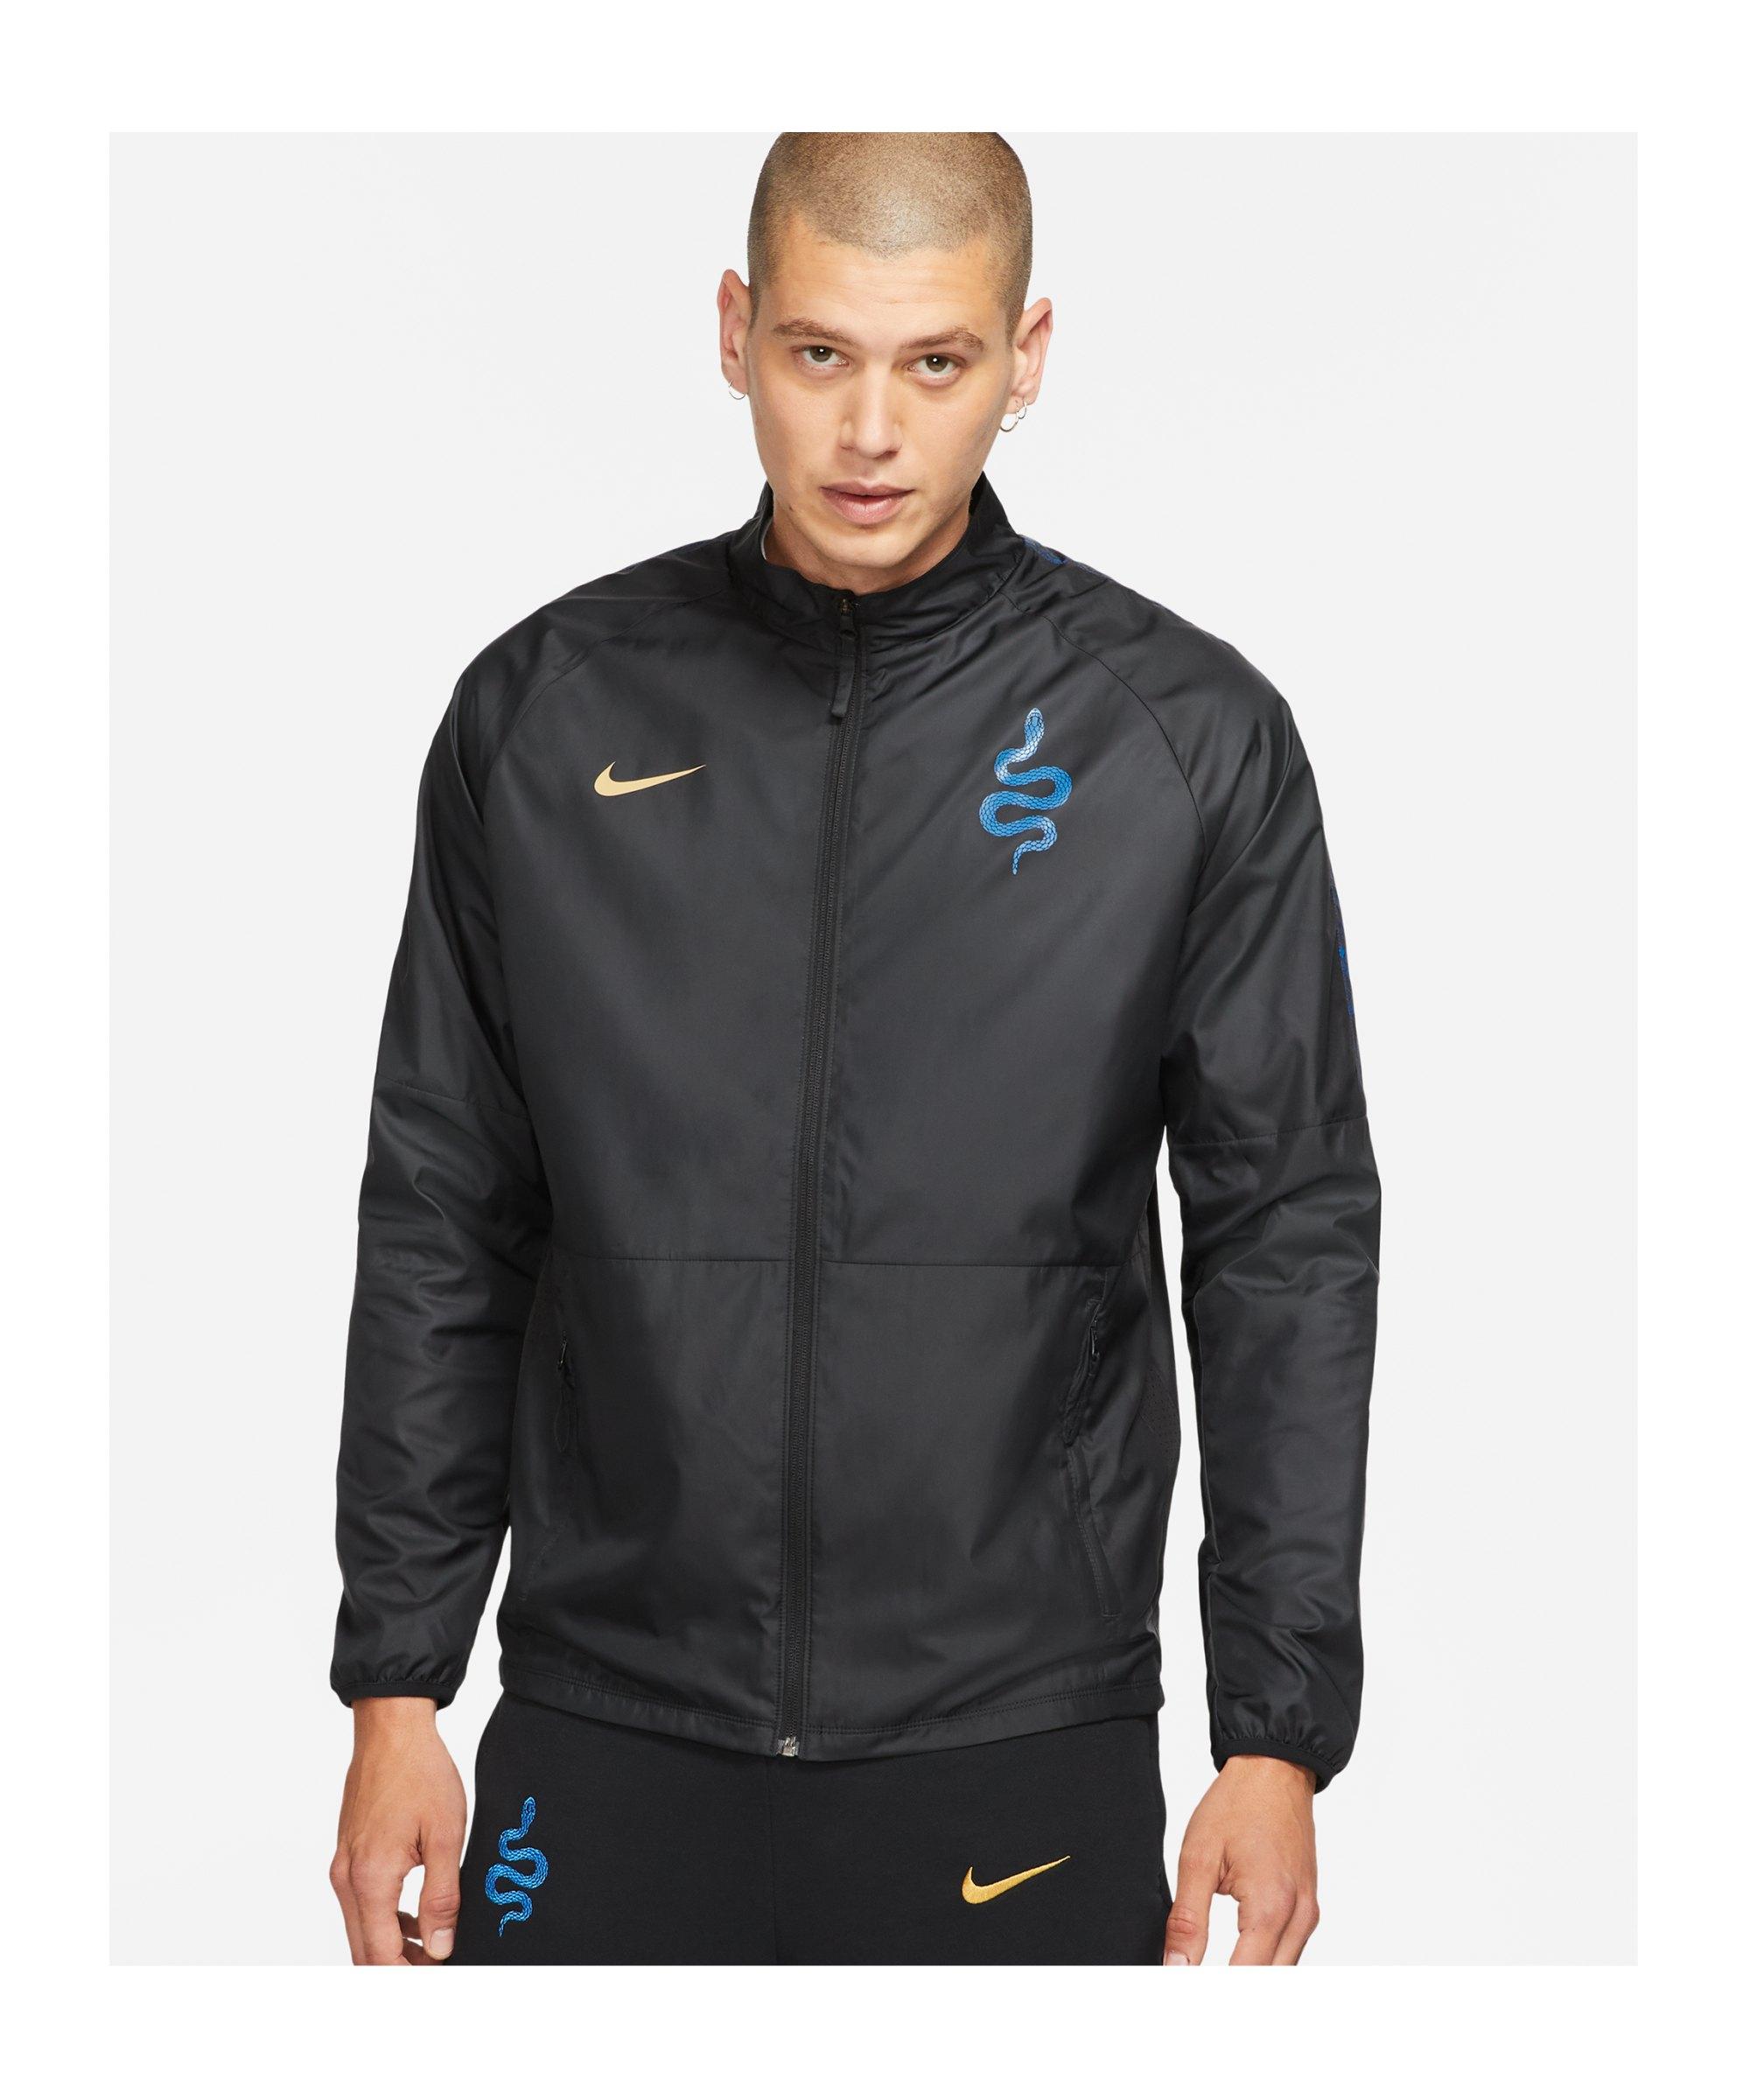 Nike Inter Mailand RPL Freizeitjacke Schwarz F010 - schwarz